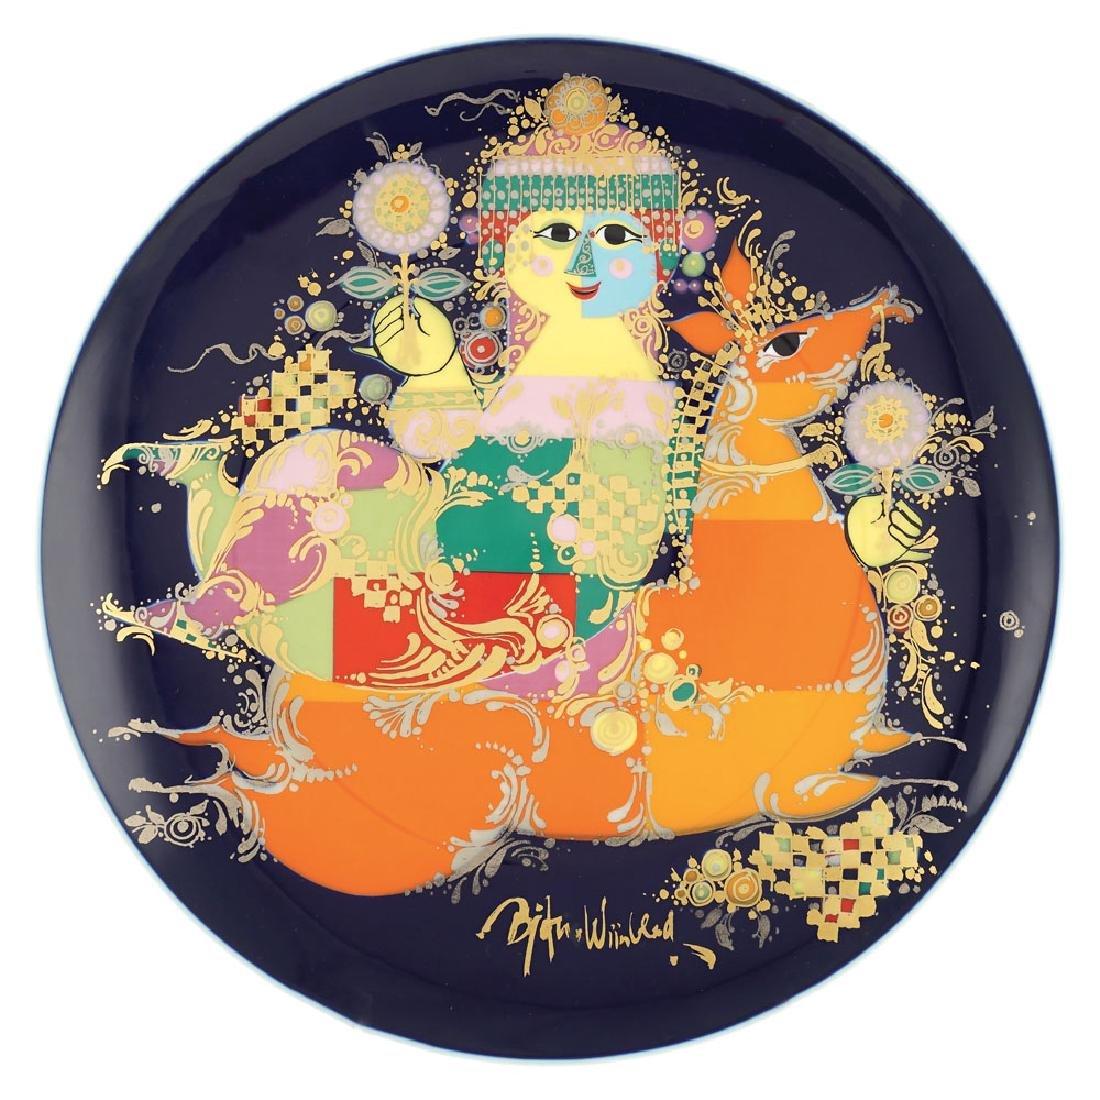 Rosenthal, Studio Line, porcelain plate Germany, 20th